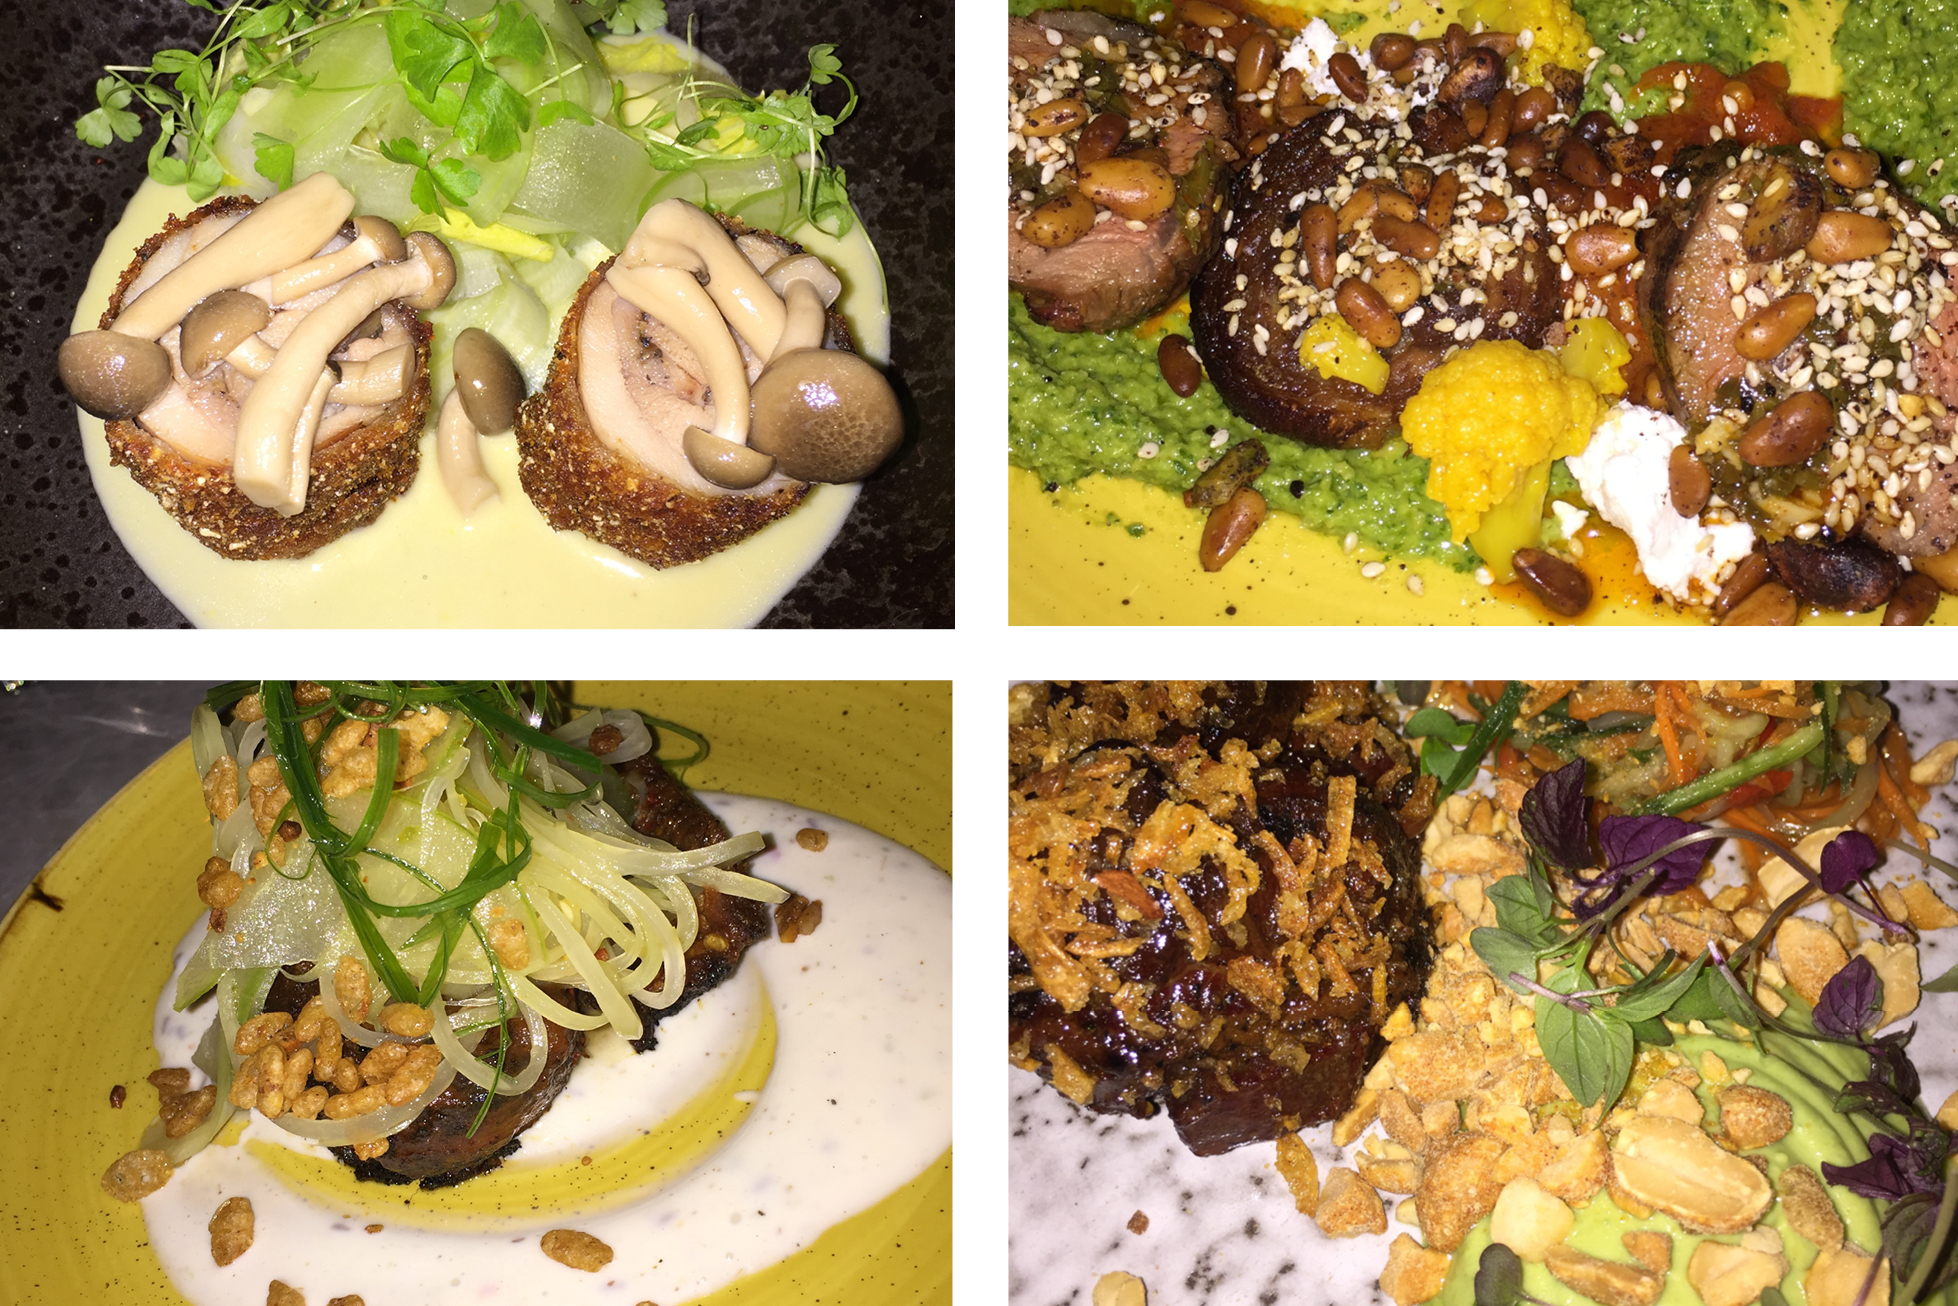 Foley's restaurant food